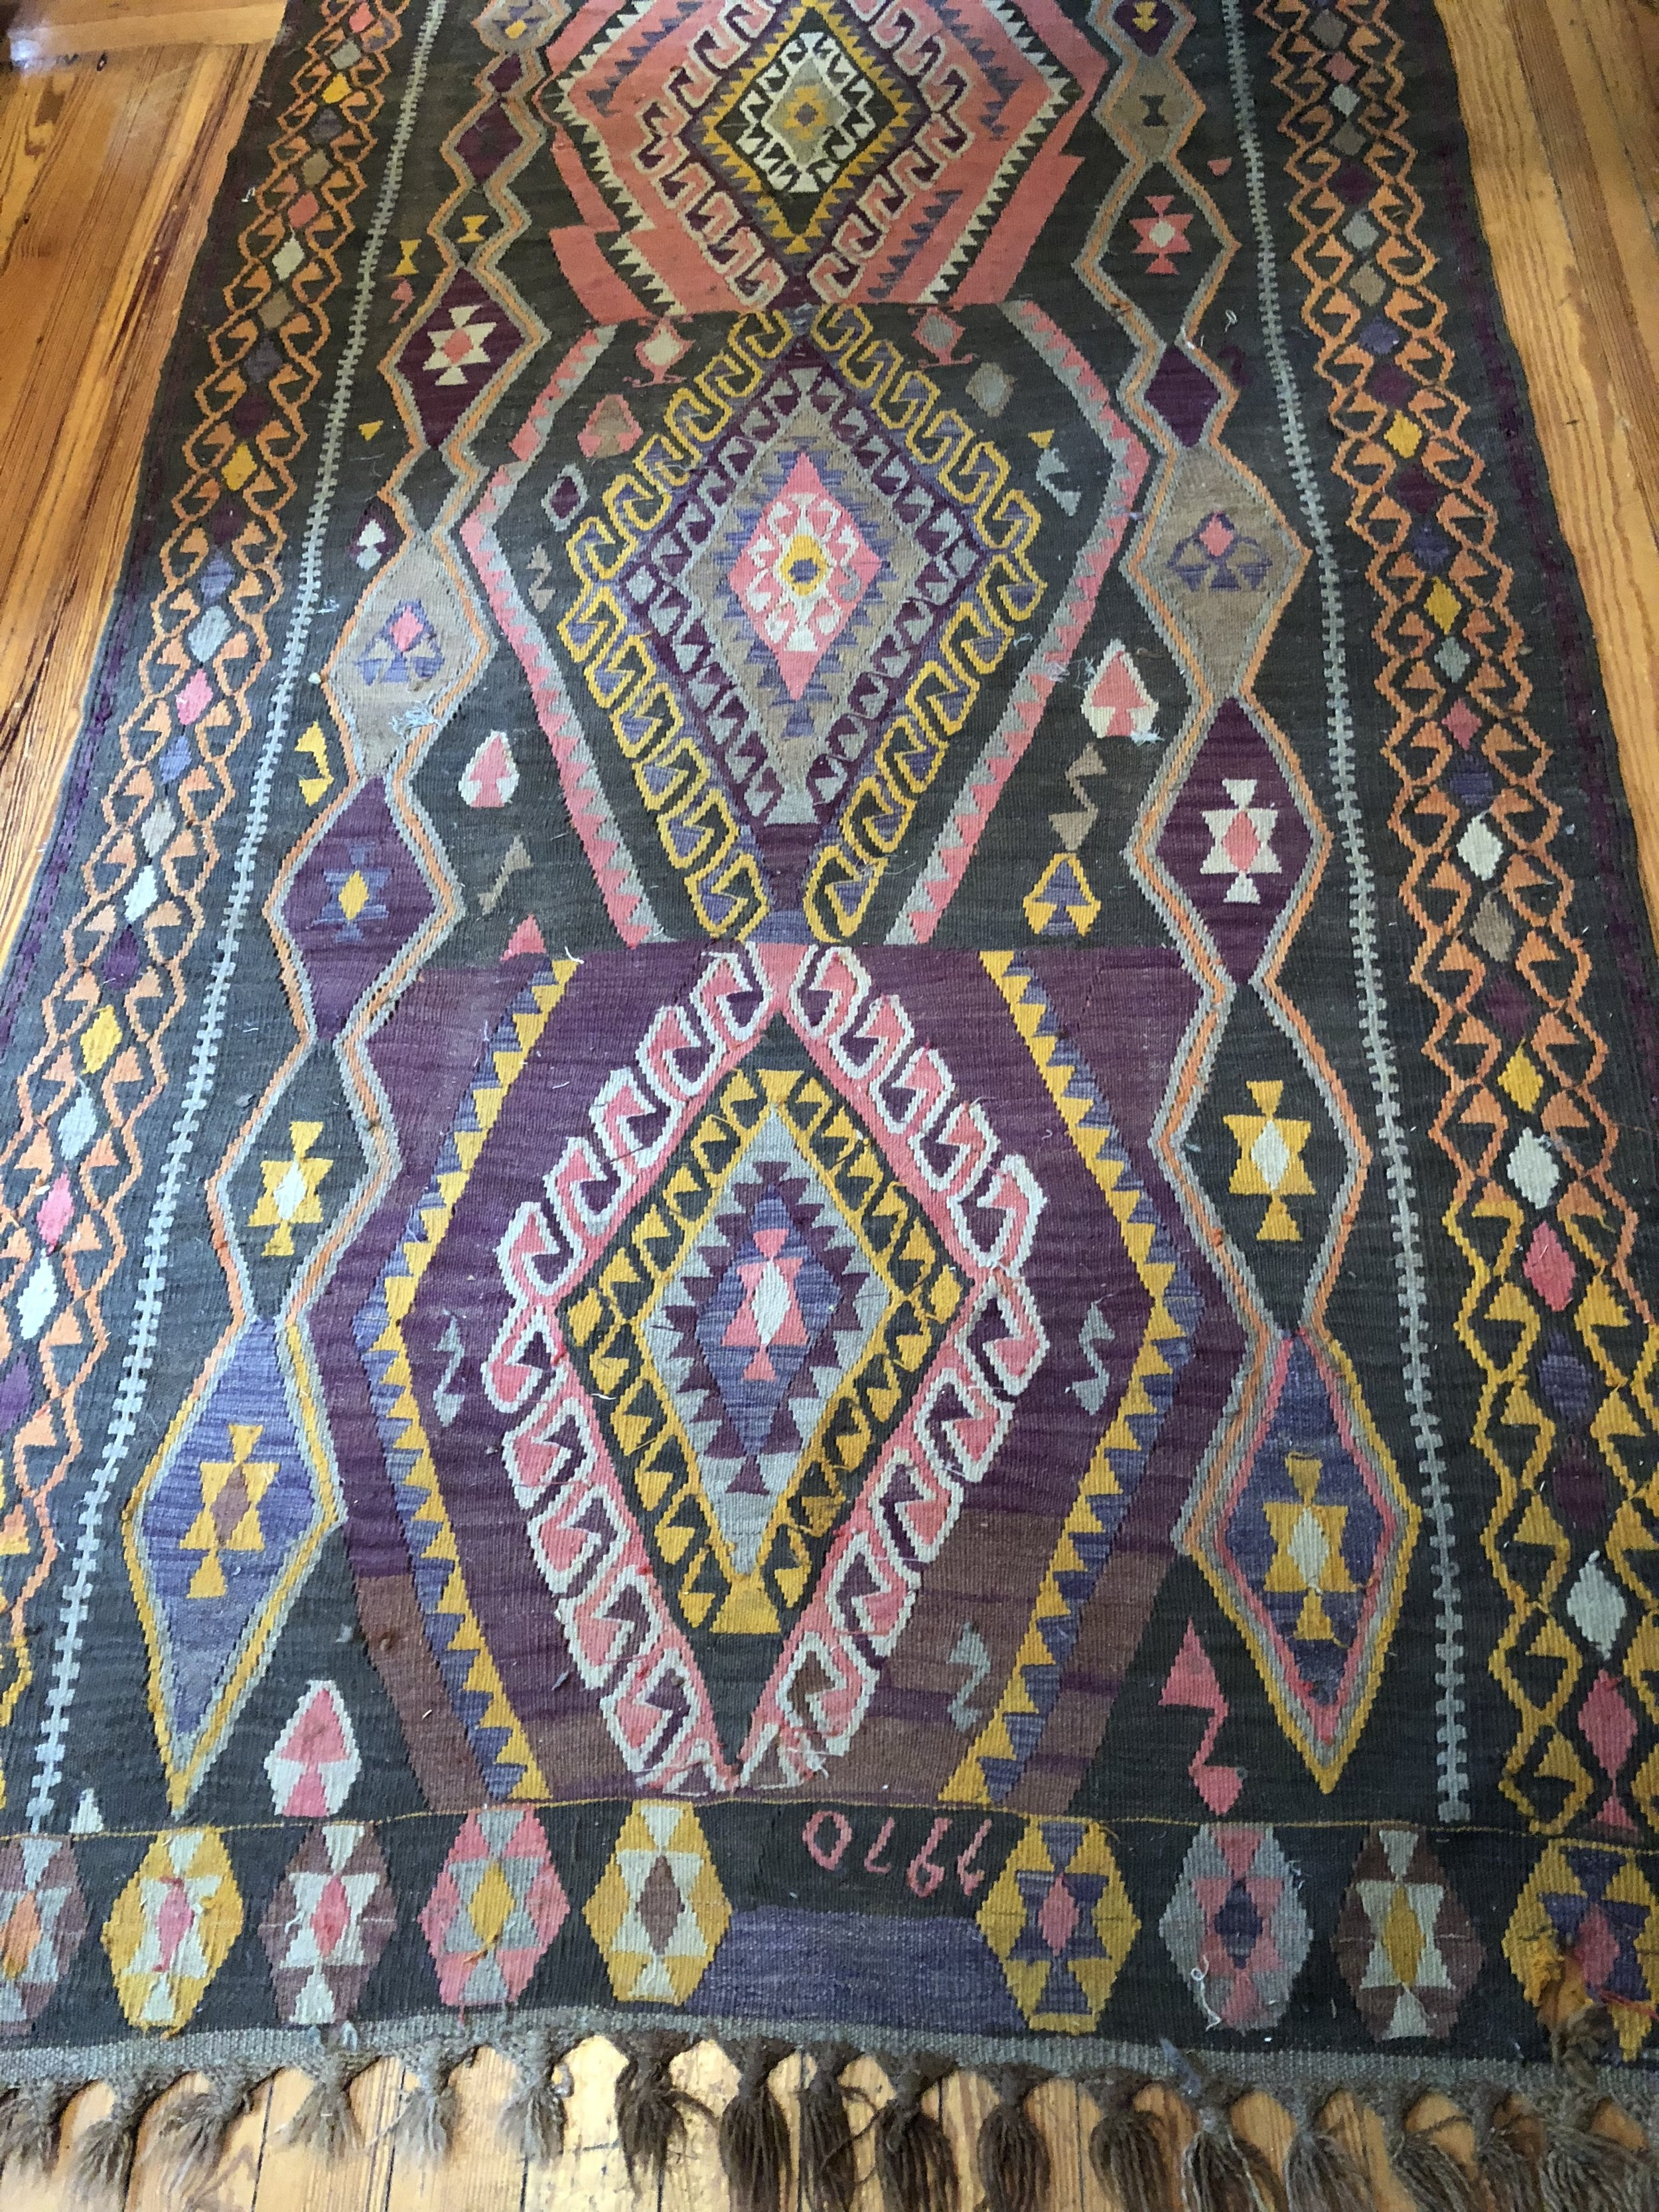 rug #12 - kilim runner 4' x 12'